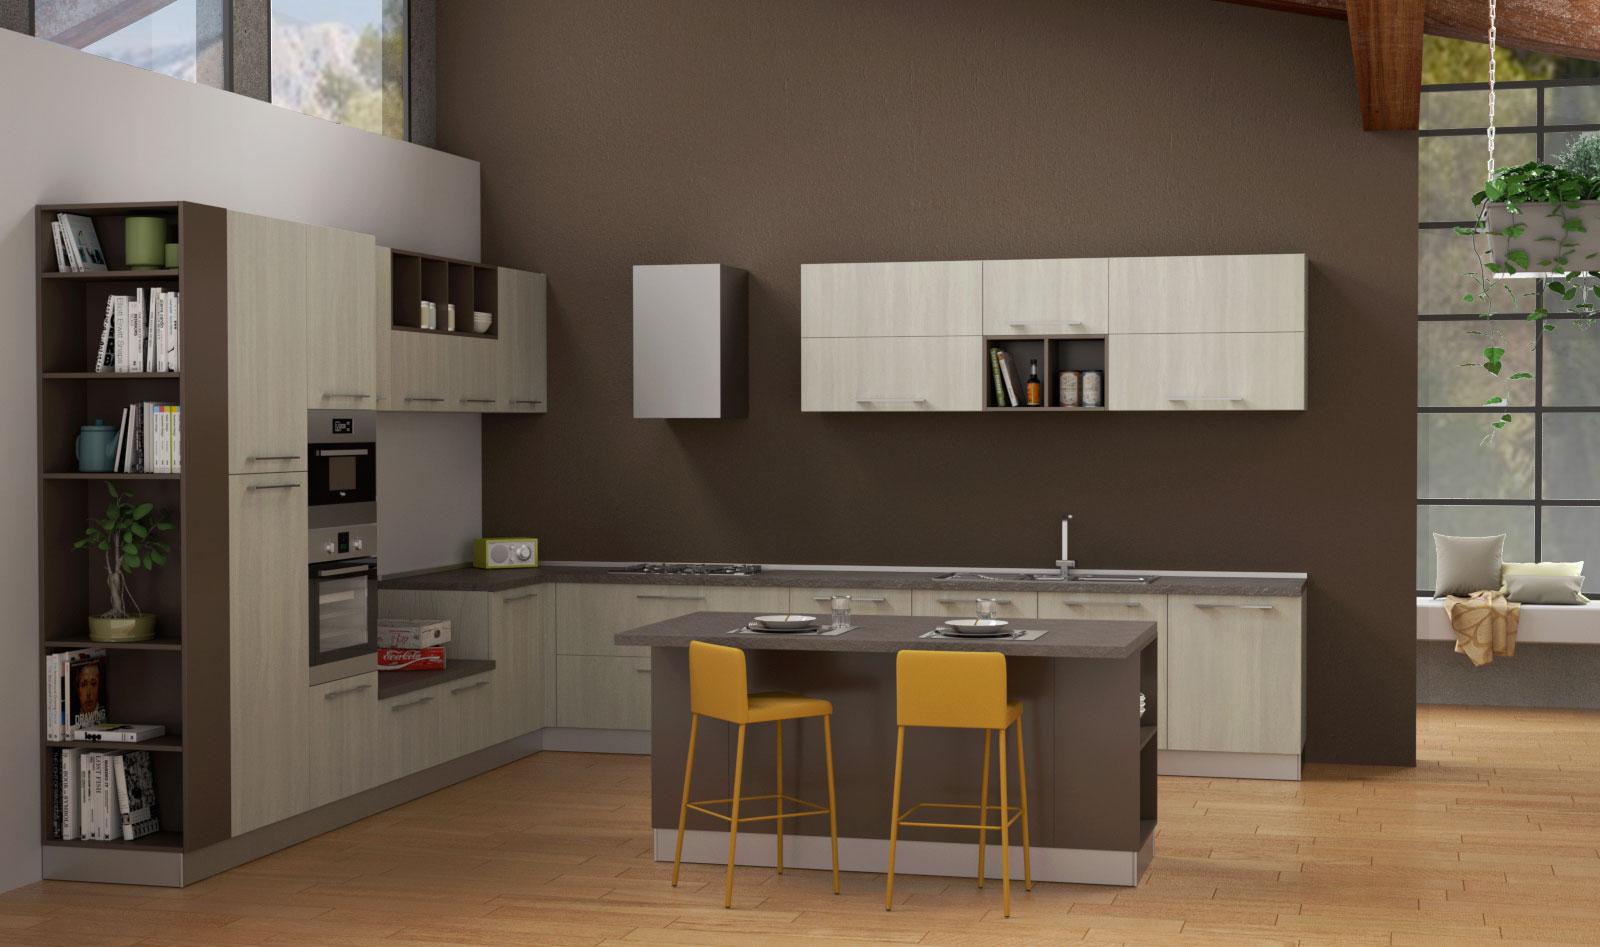 Cucine componibili sistema 901 arredaclick for Cucine componibili